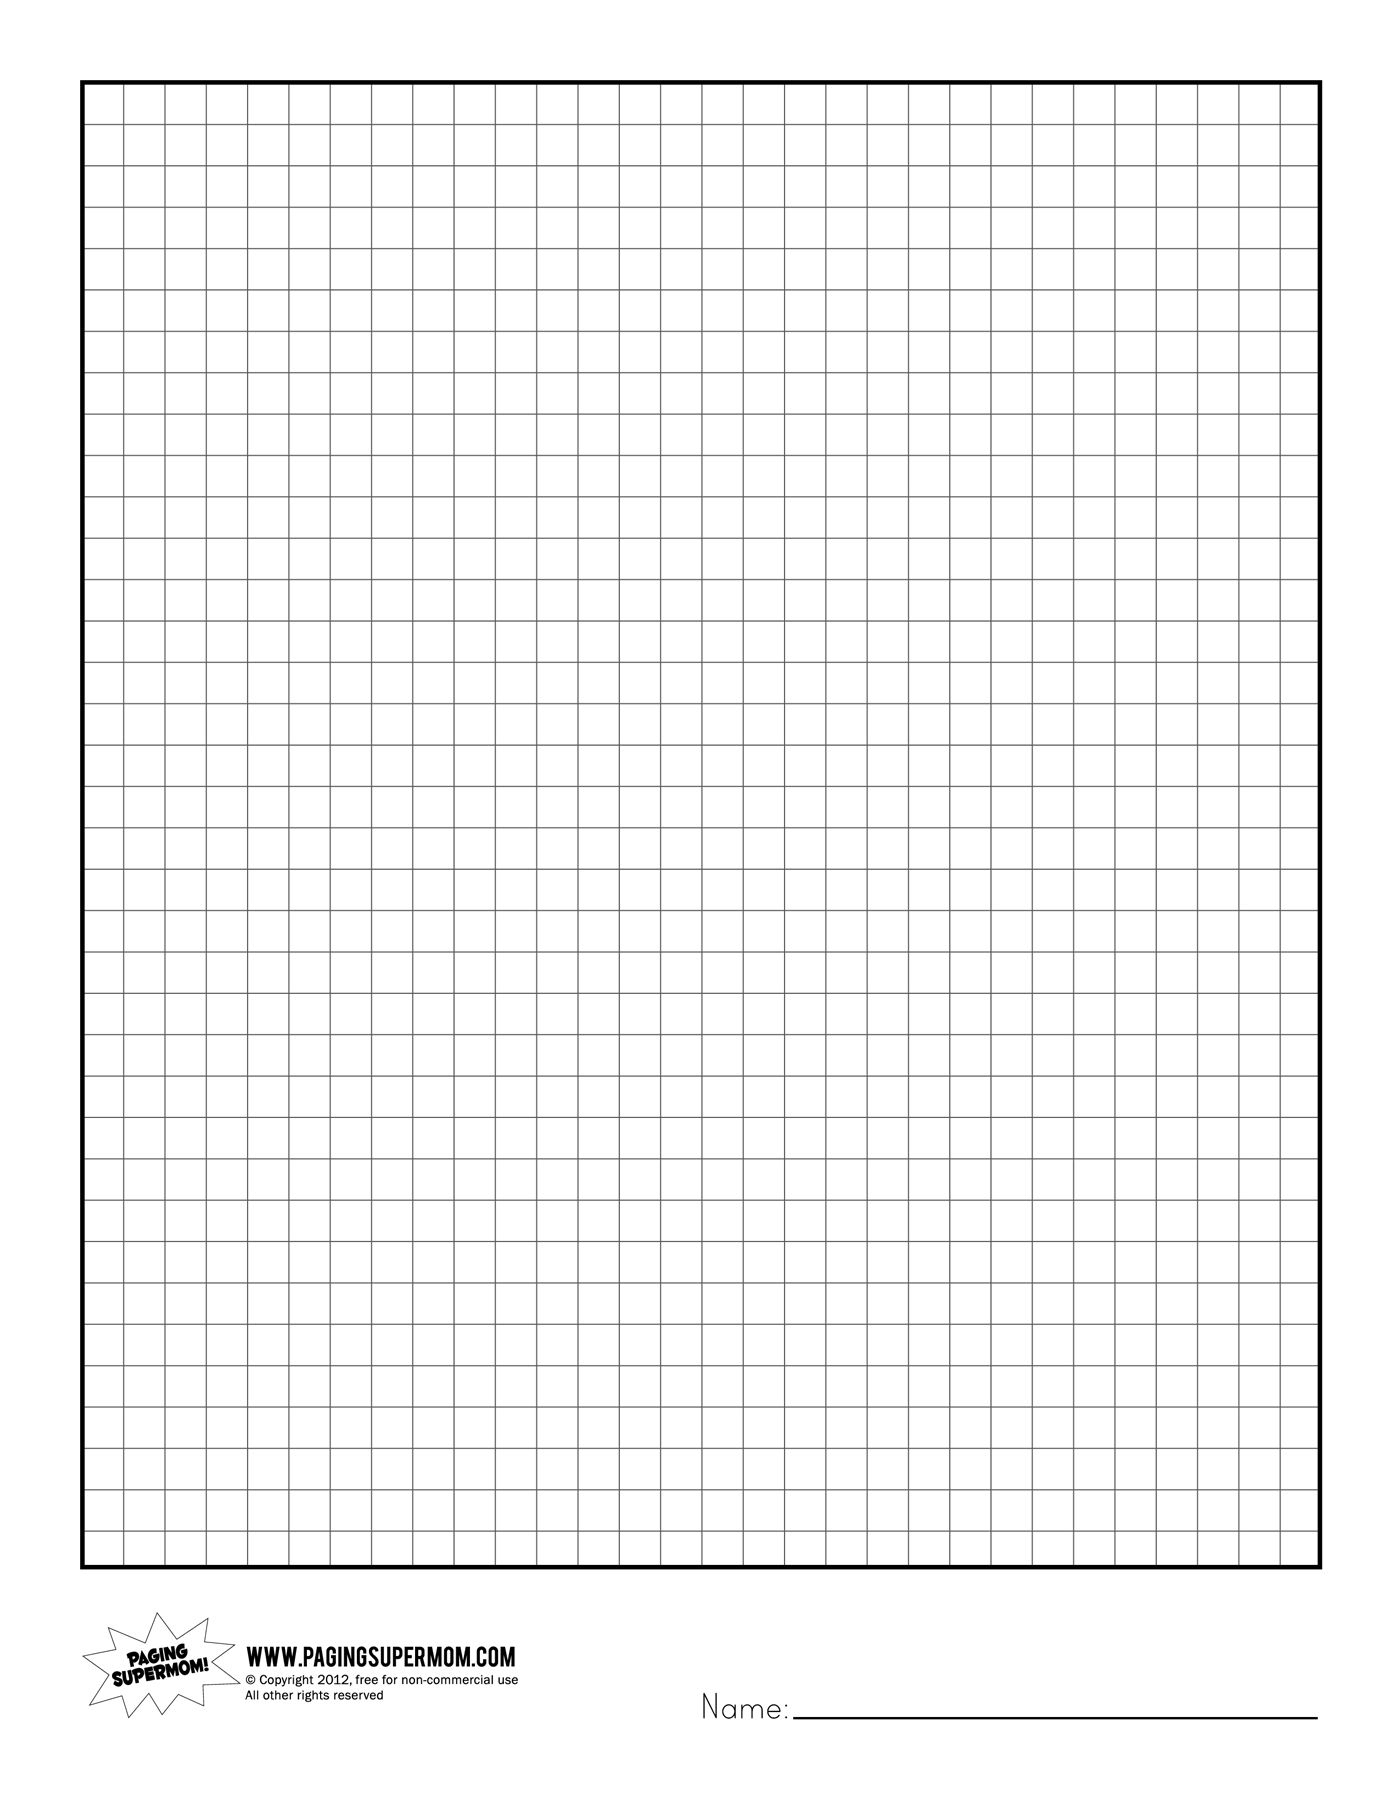 Printable Graph Paper | Healthy Eating | Printable Graph Paper - Free Printable Grid Paper